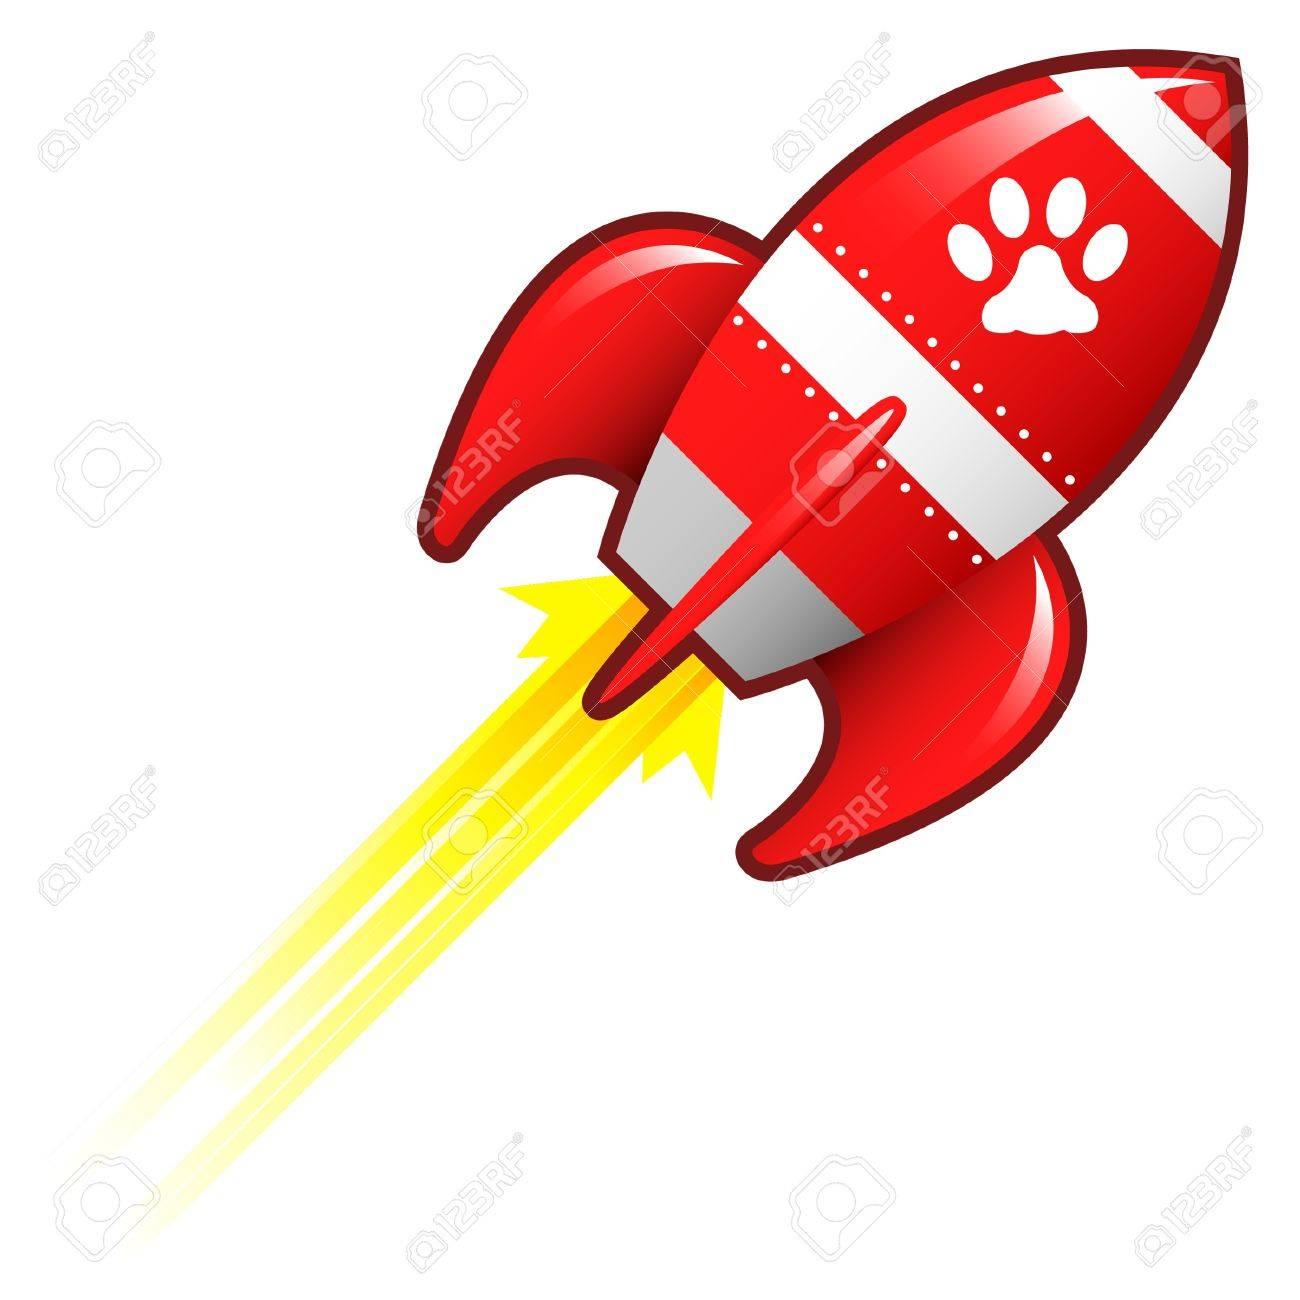 Pet paw print icon on red retro rocket ship illustration Stock Illustration - 14417330